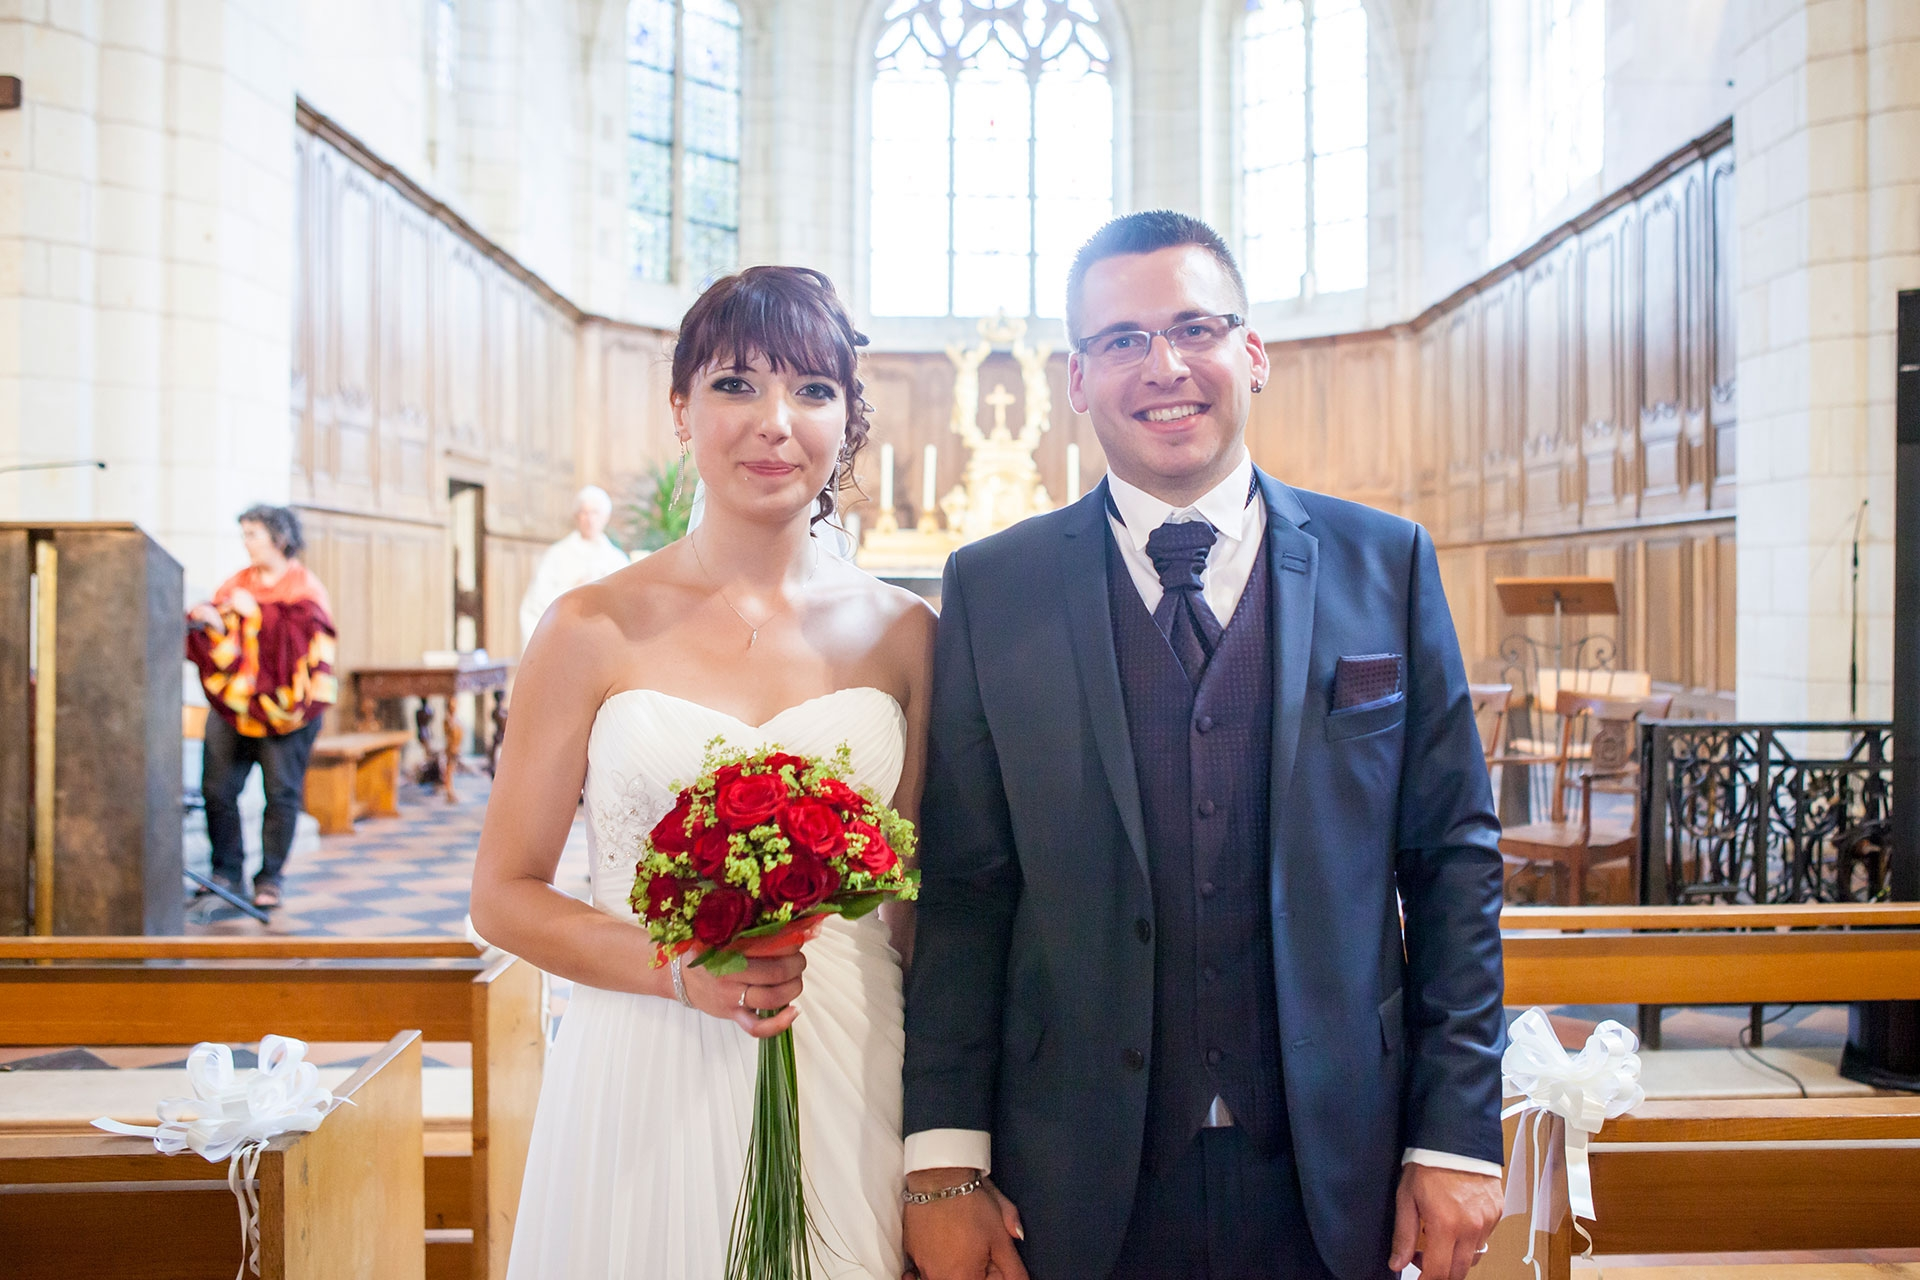 particuliers-evenements-mariages-oui-aurelie&geoffrey-23